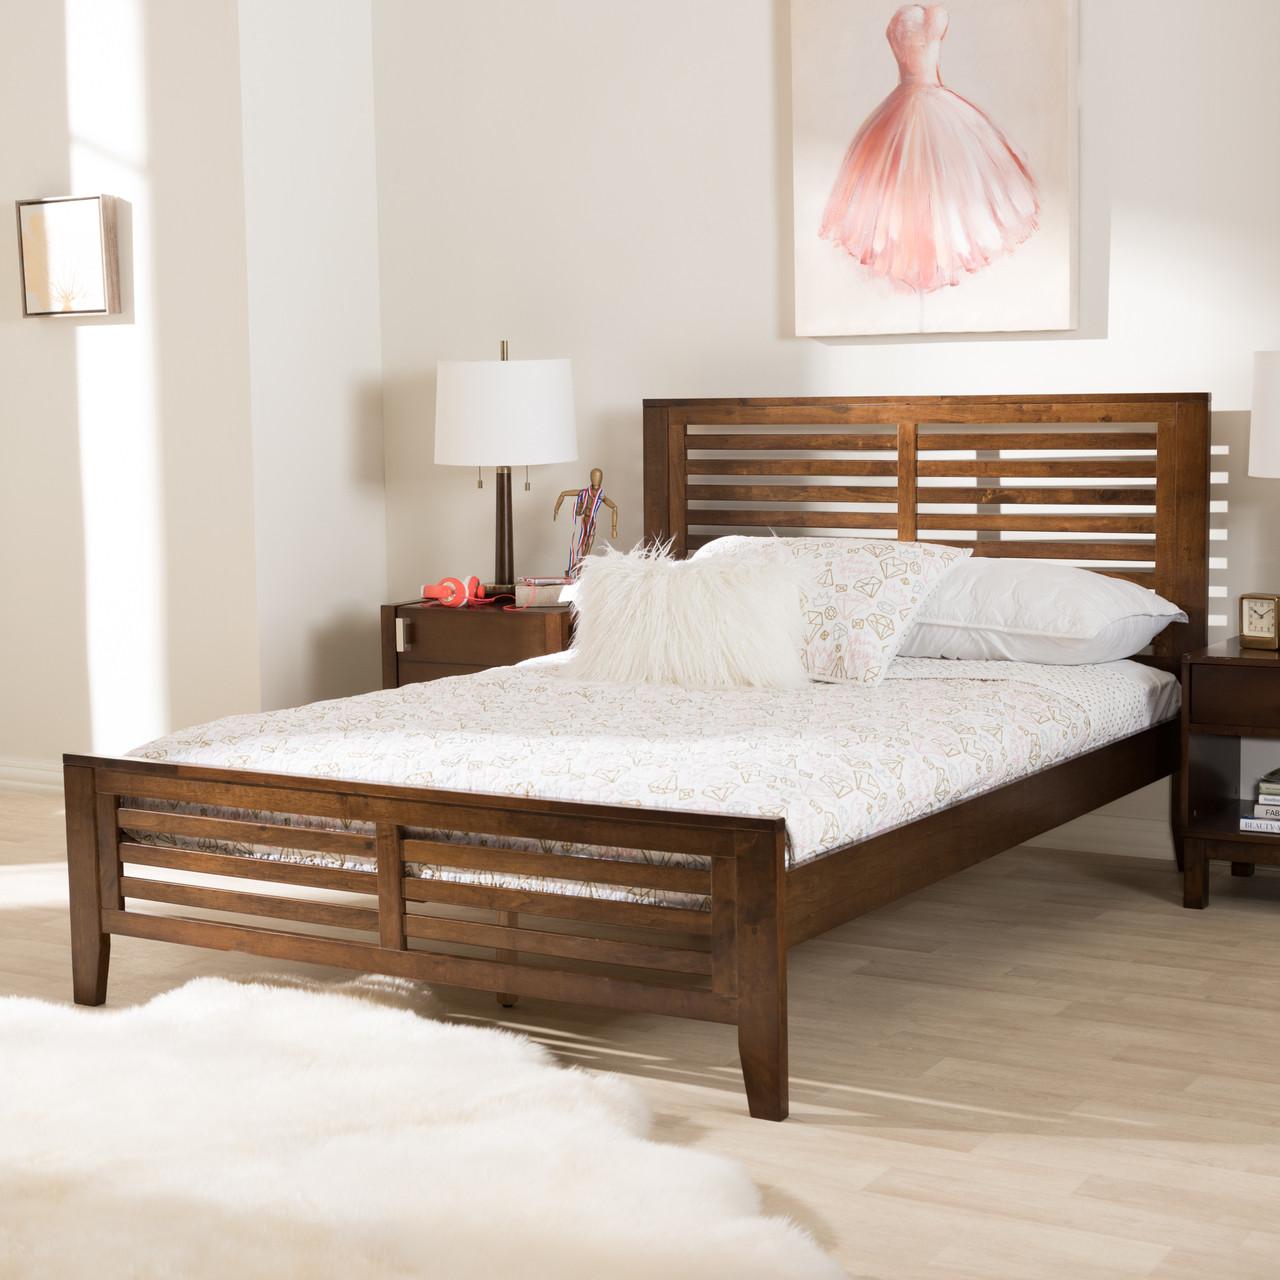 4360463747 Baxton Studio Sedona Modern Classic Mission Style Walnut Brown-Finished Wood  Full Platform Bed - DealBeds.com